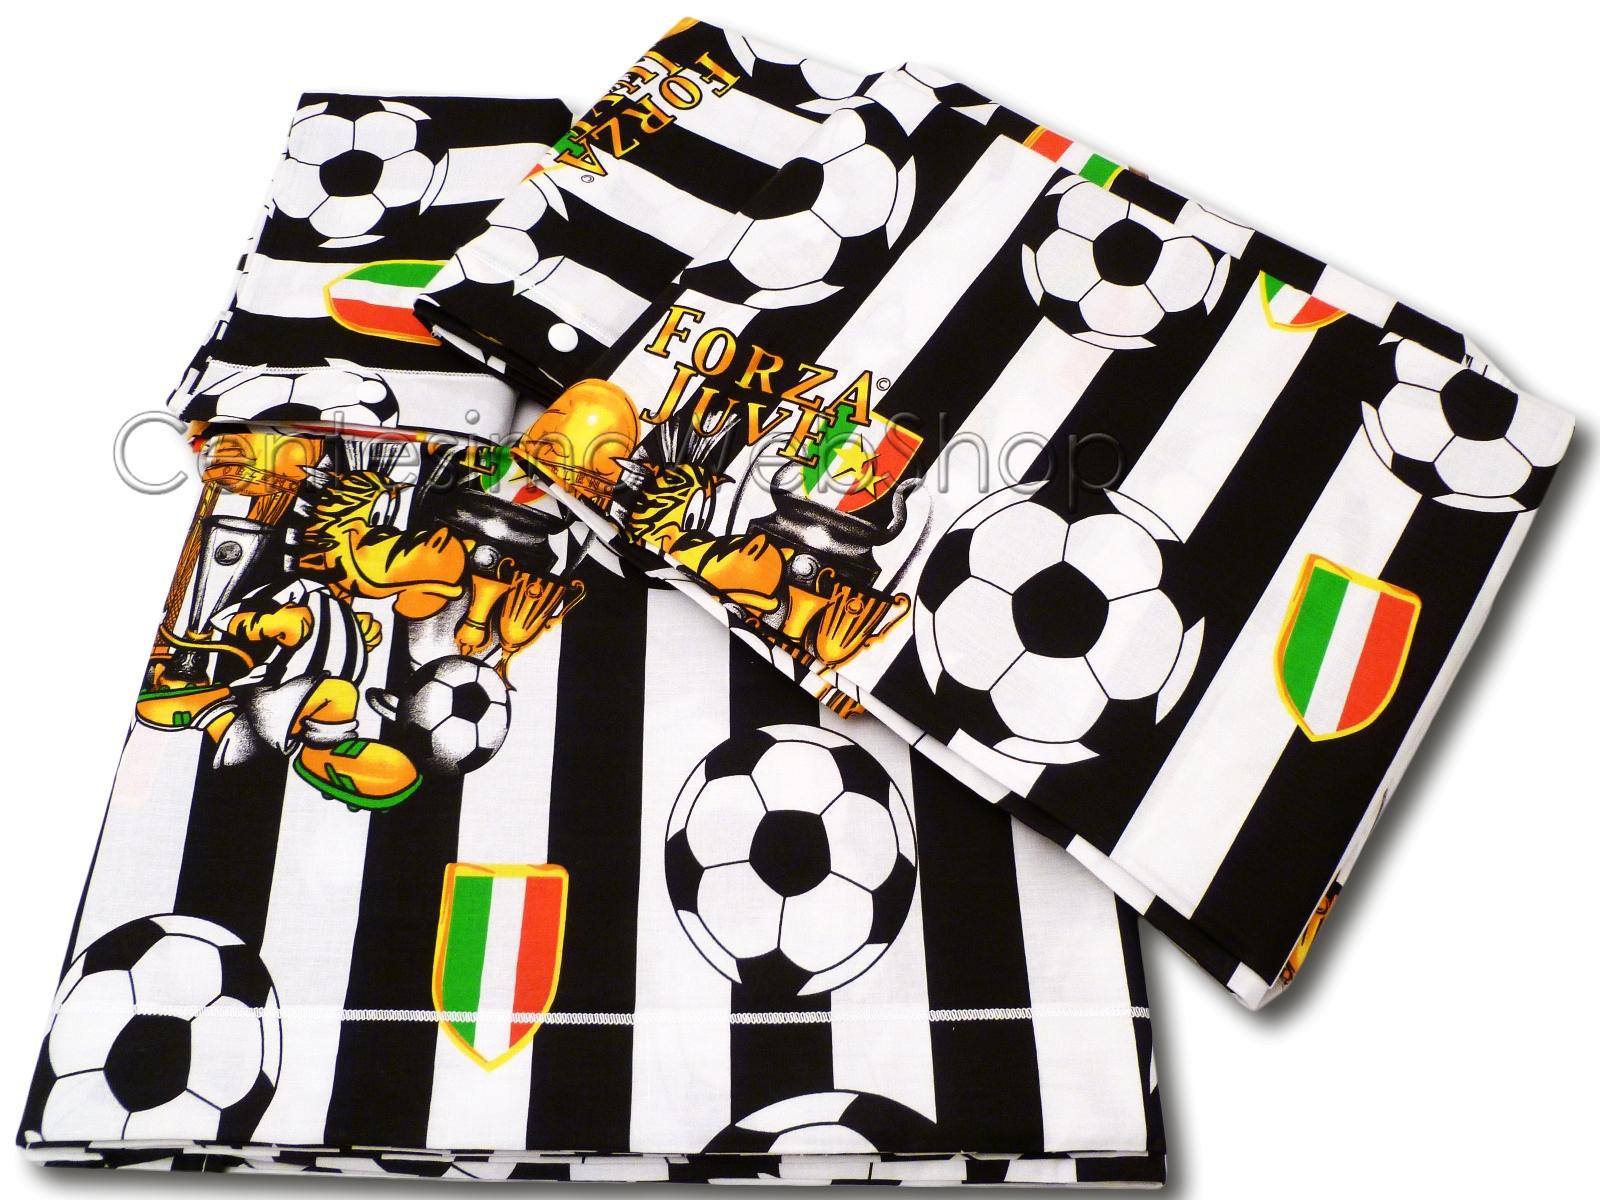 Lenzuola Matrimoniali Juventus.Completo Lenzuola Singolo Calcio Bianco Nero Juve Una Piazza Idea